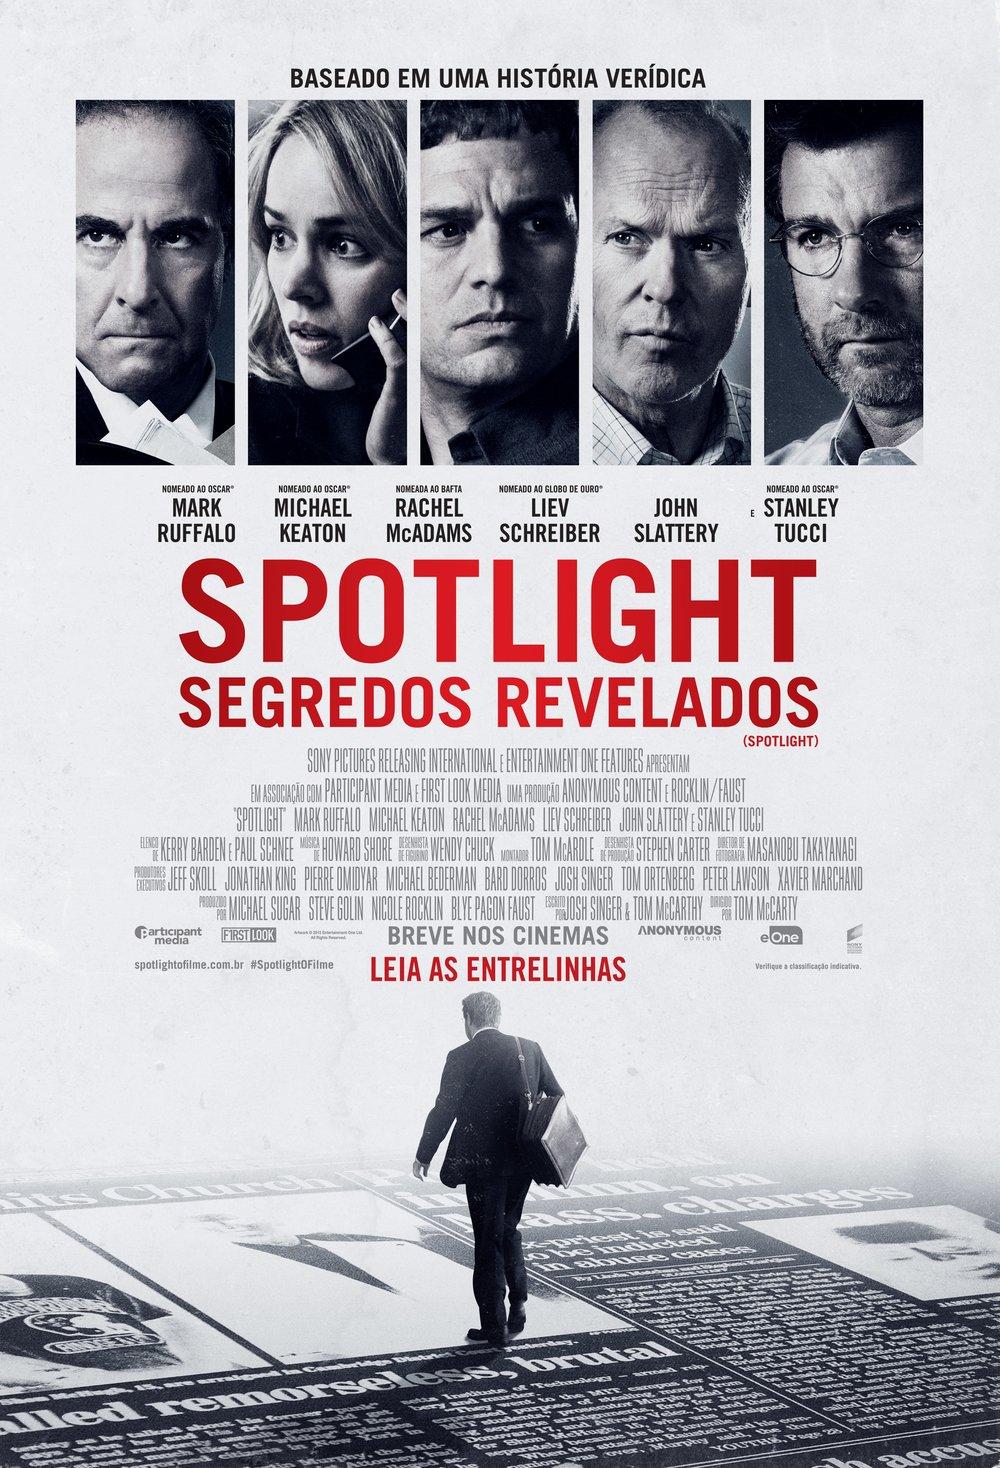 spotlight_poster_brazil1.jpg